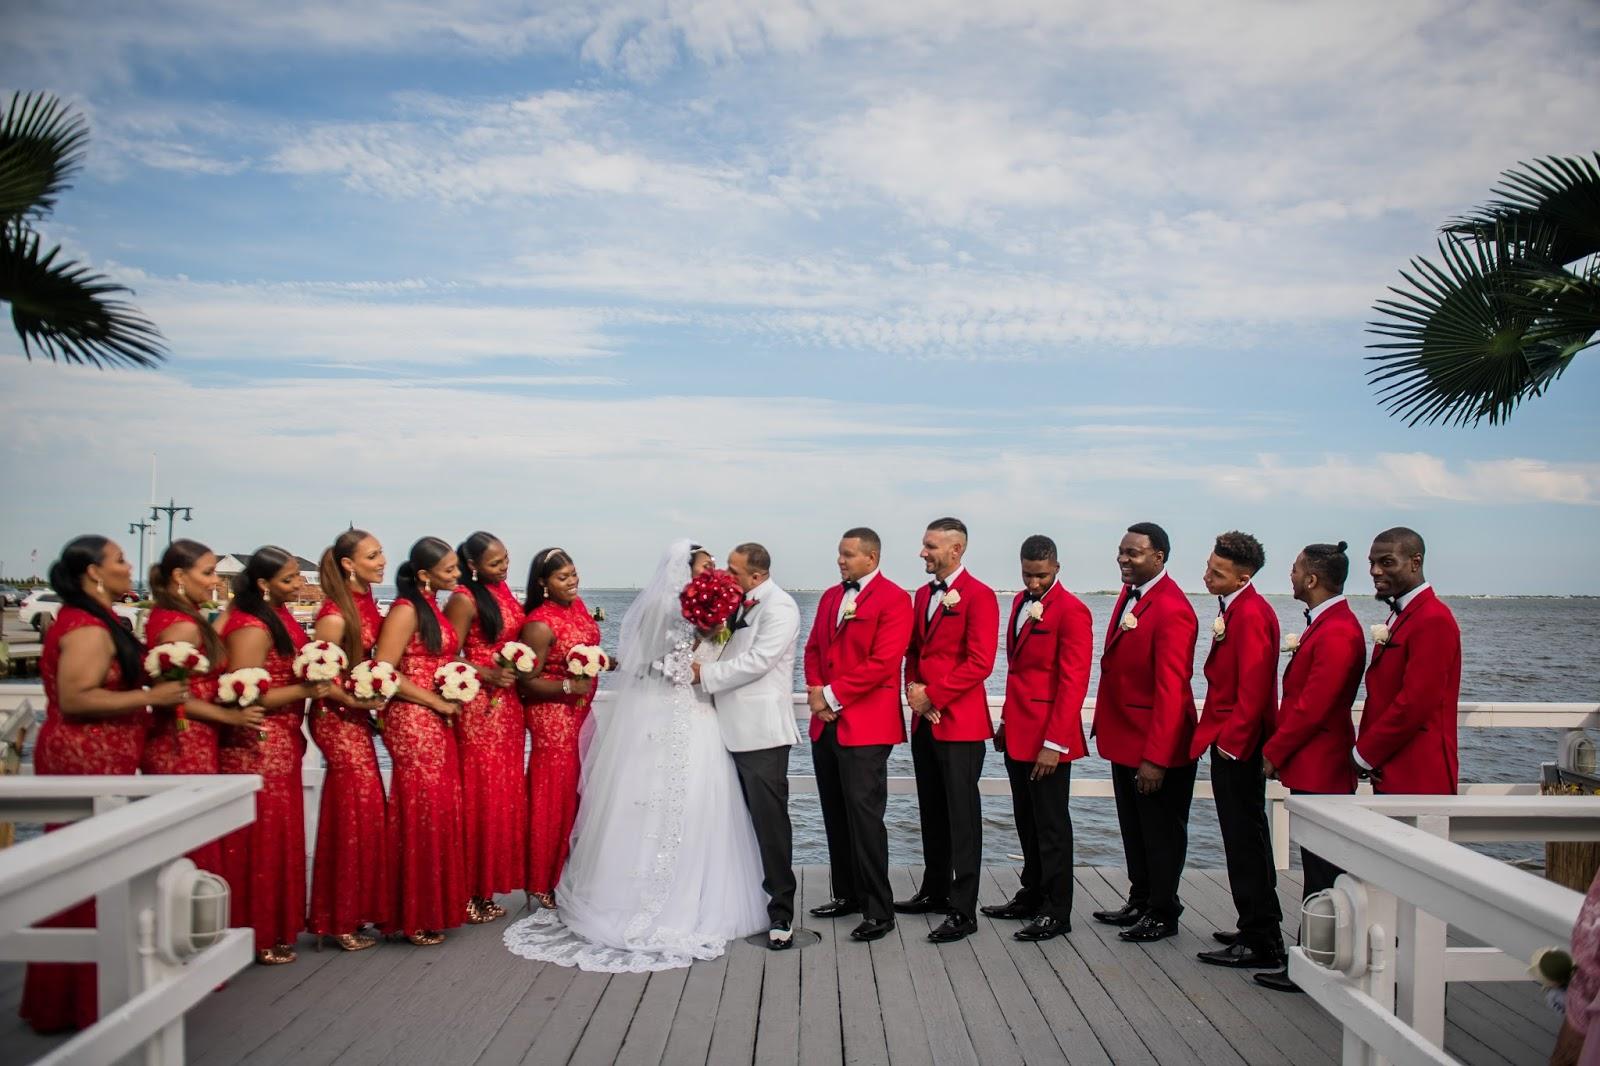 cwedding photography affordable